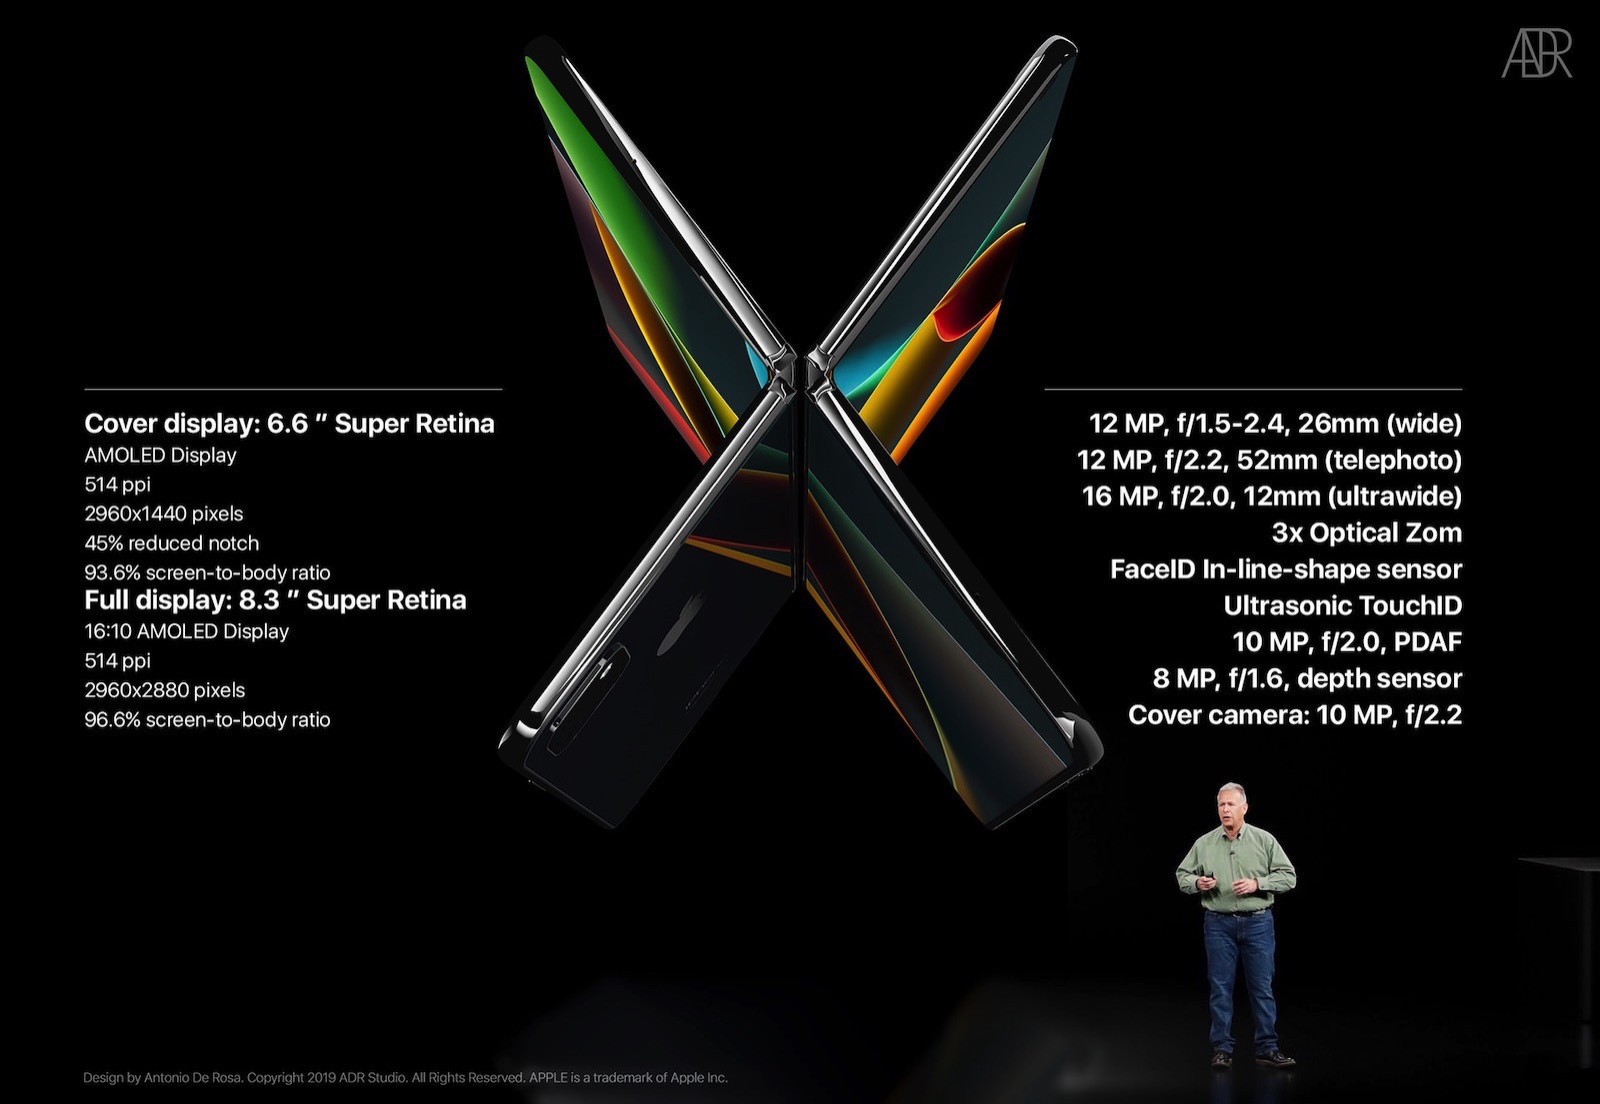 iphone-x-fold-concept-image-1.jpg